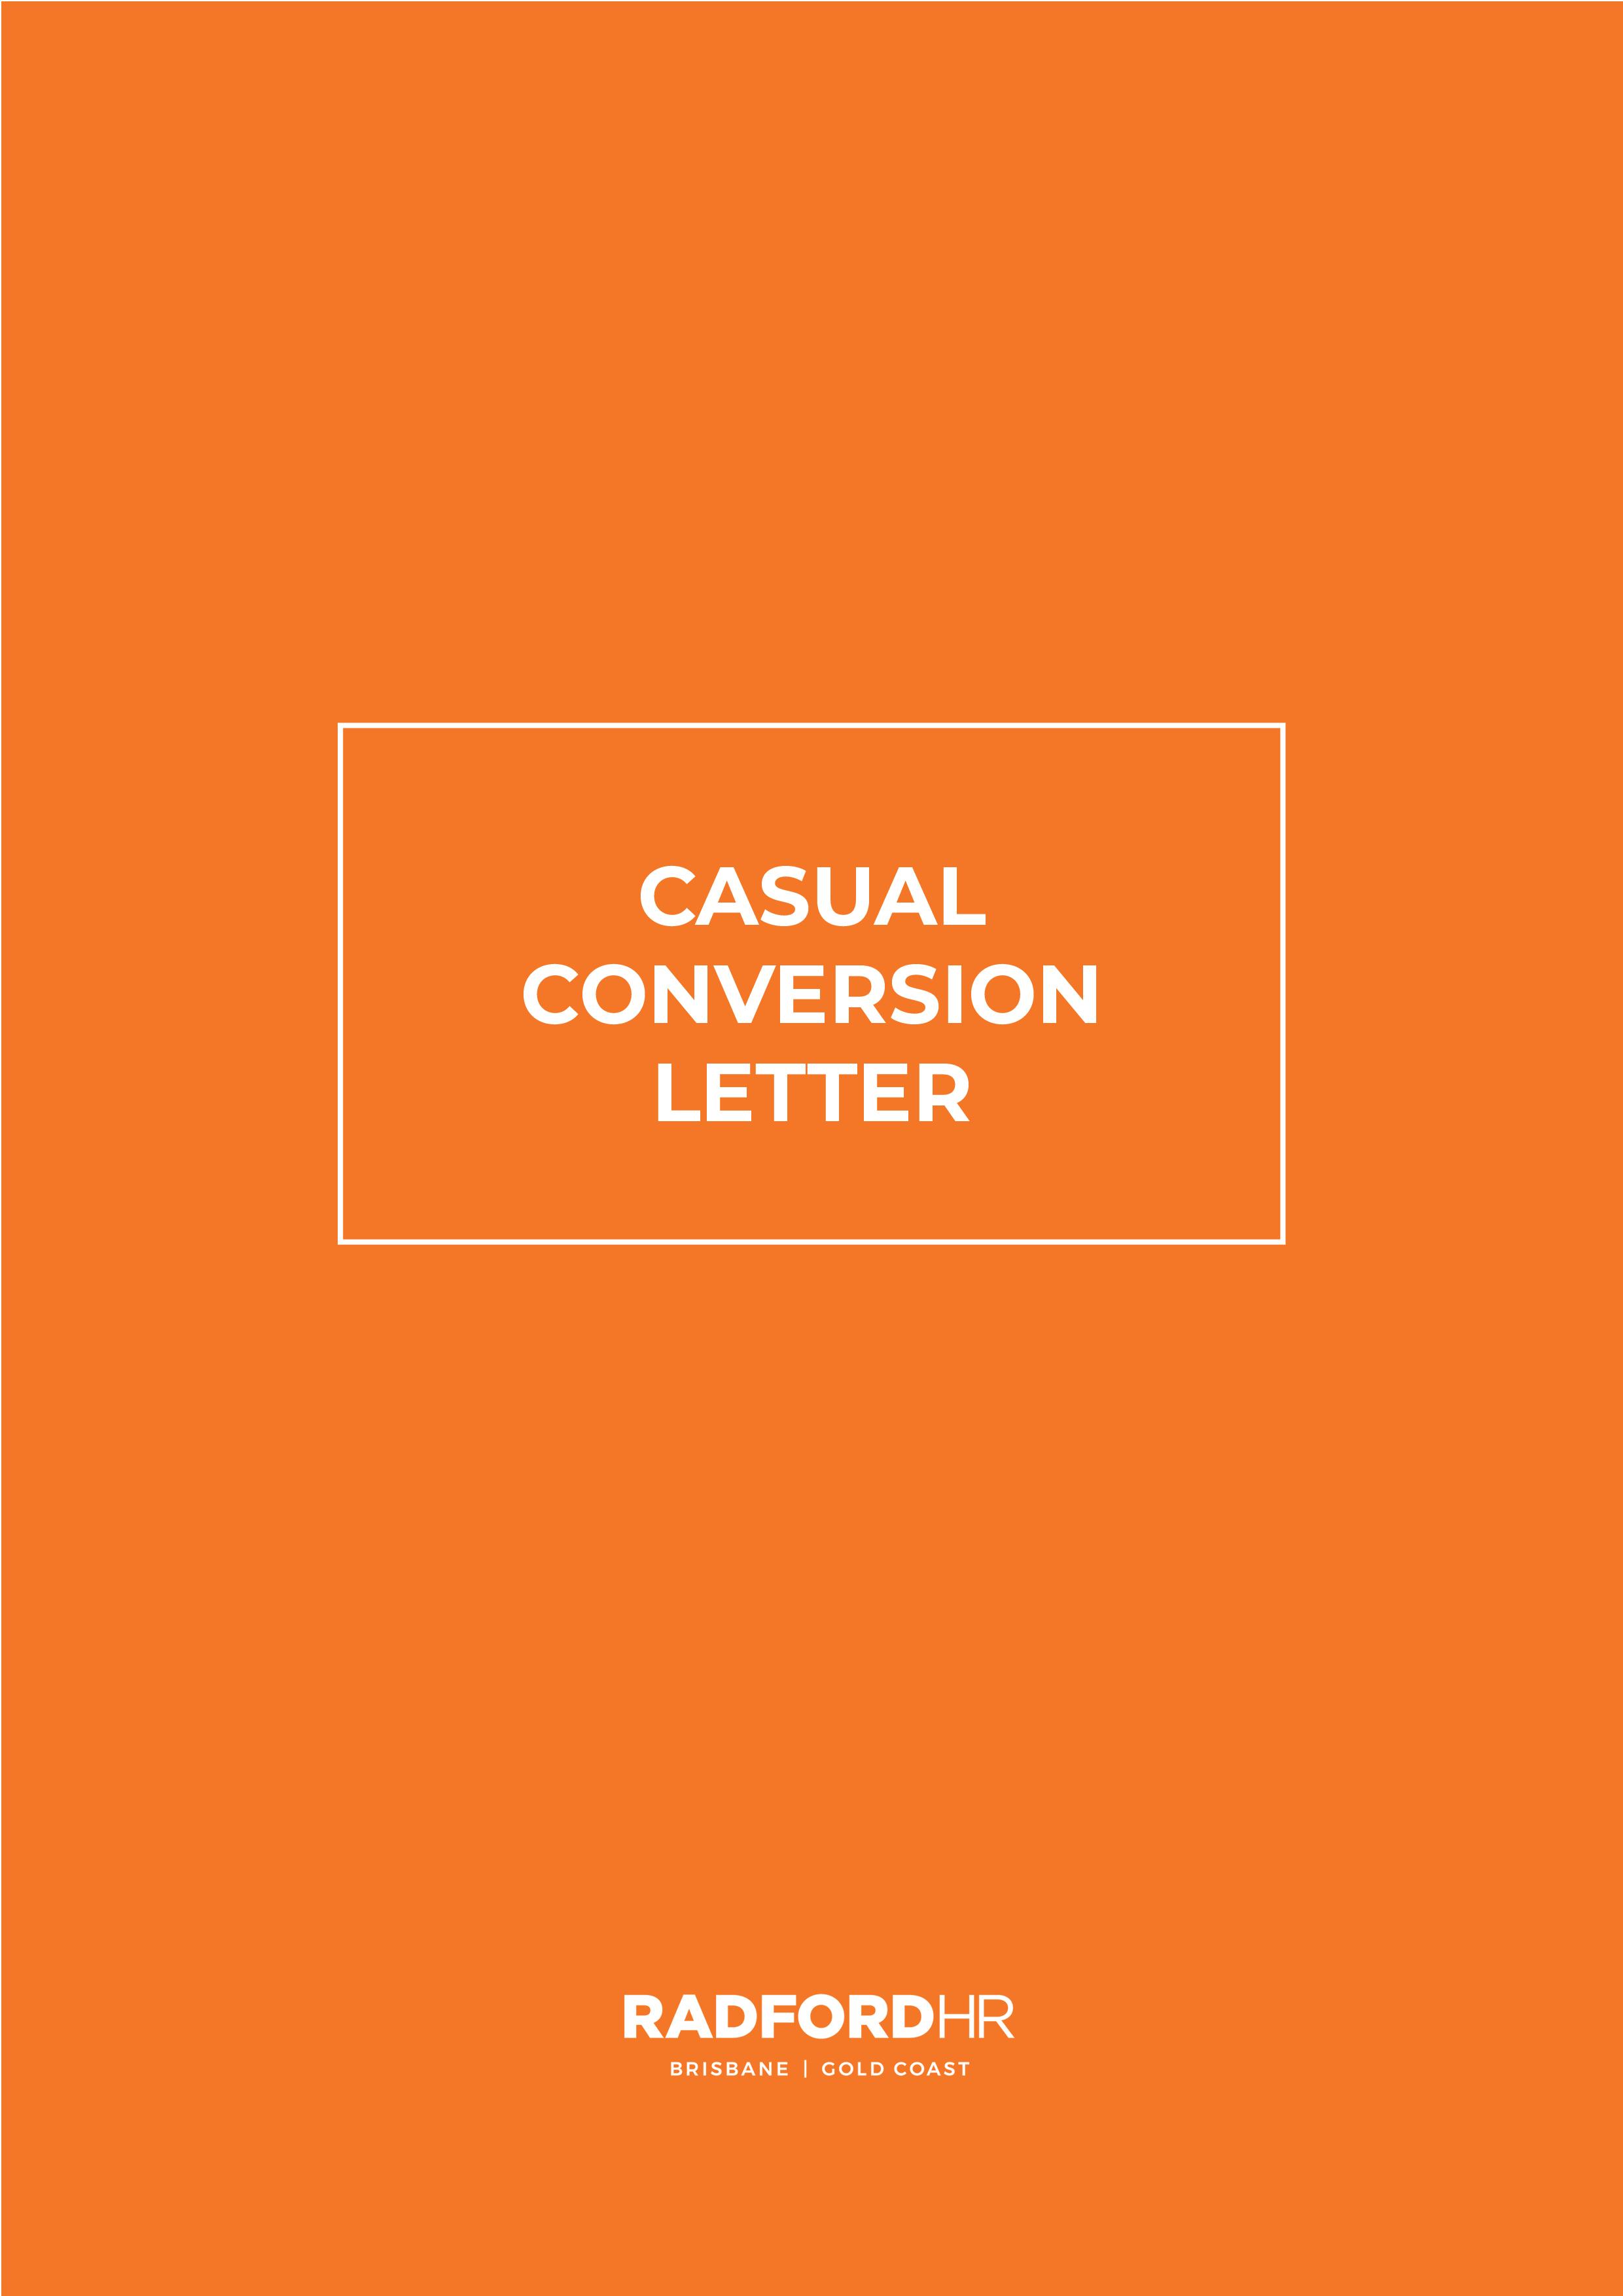 Casual Conversion Letter